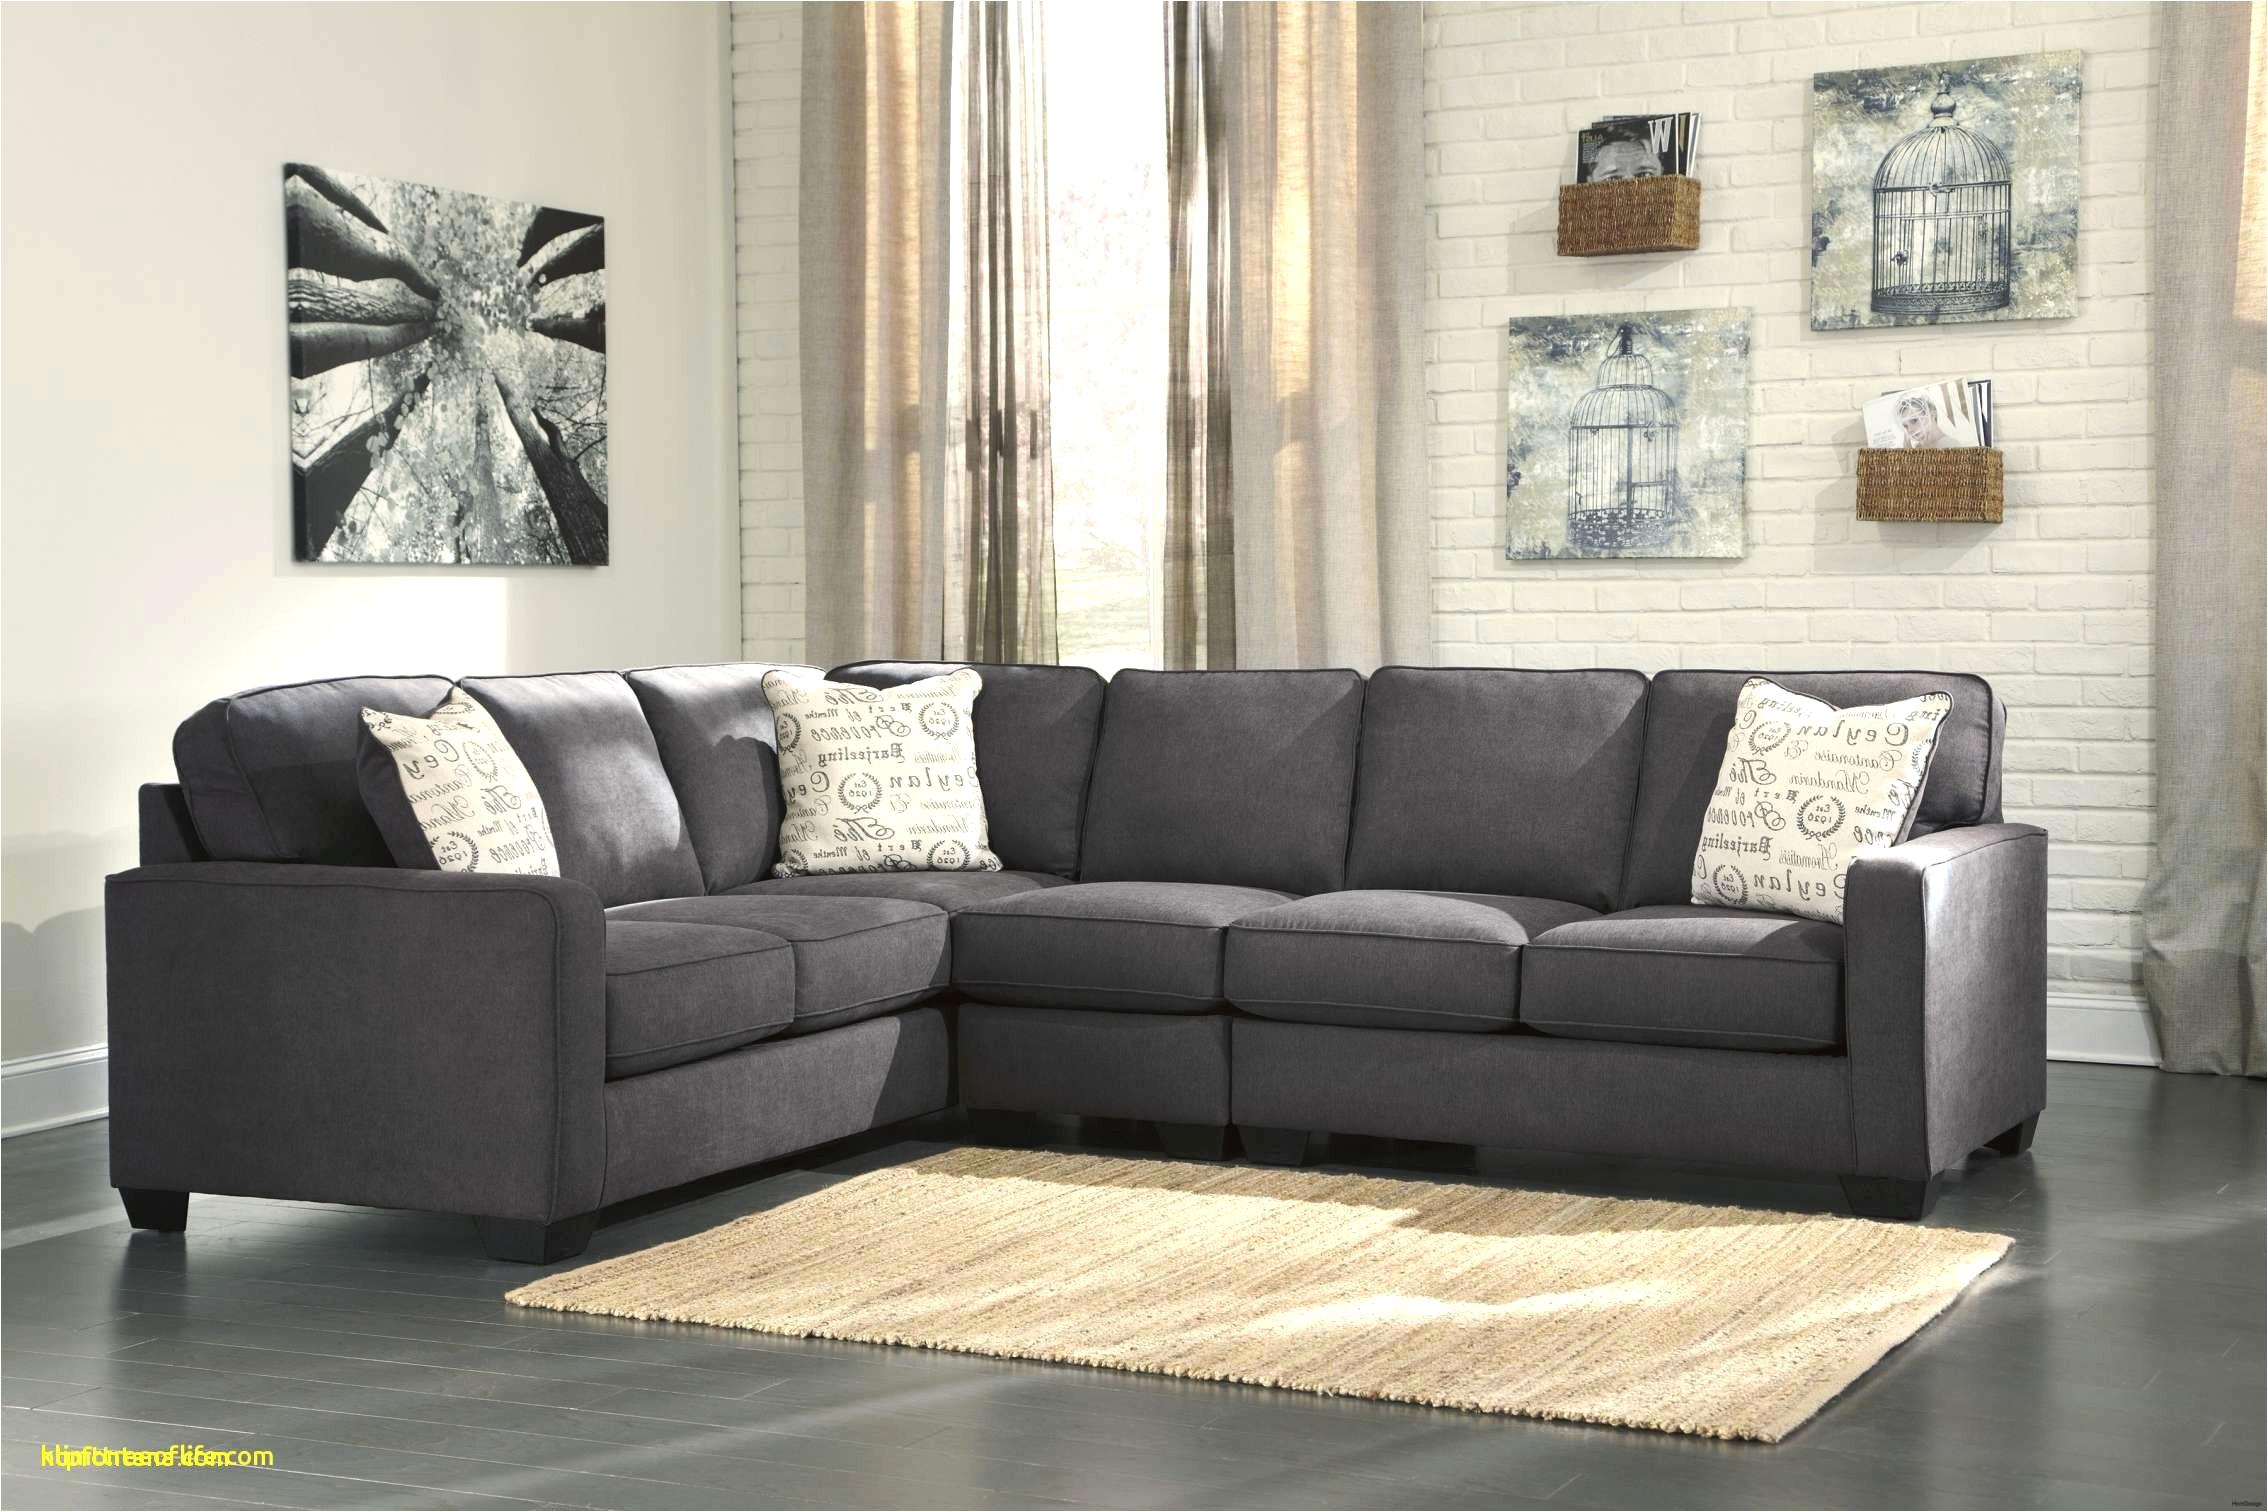 inspirational ashley furniture sleeper sofa 78 fresh gray sectional ashley furniture